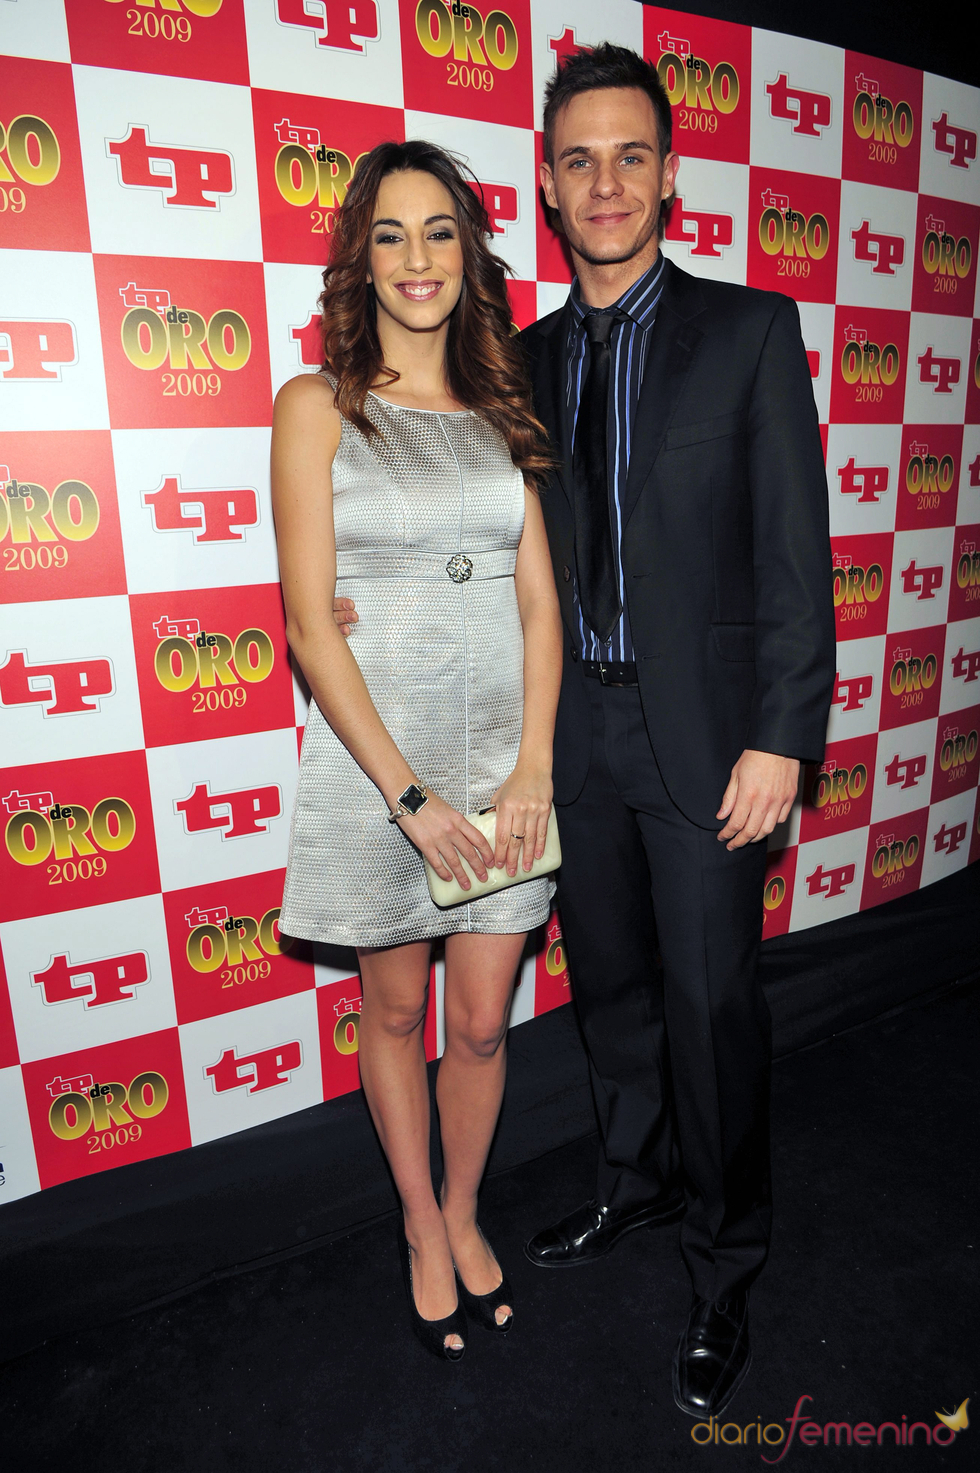 Premios TP: Christian Gálvez y Almudena Cid